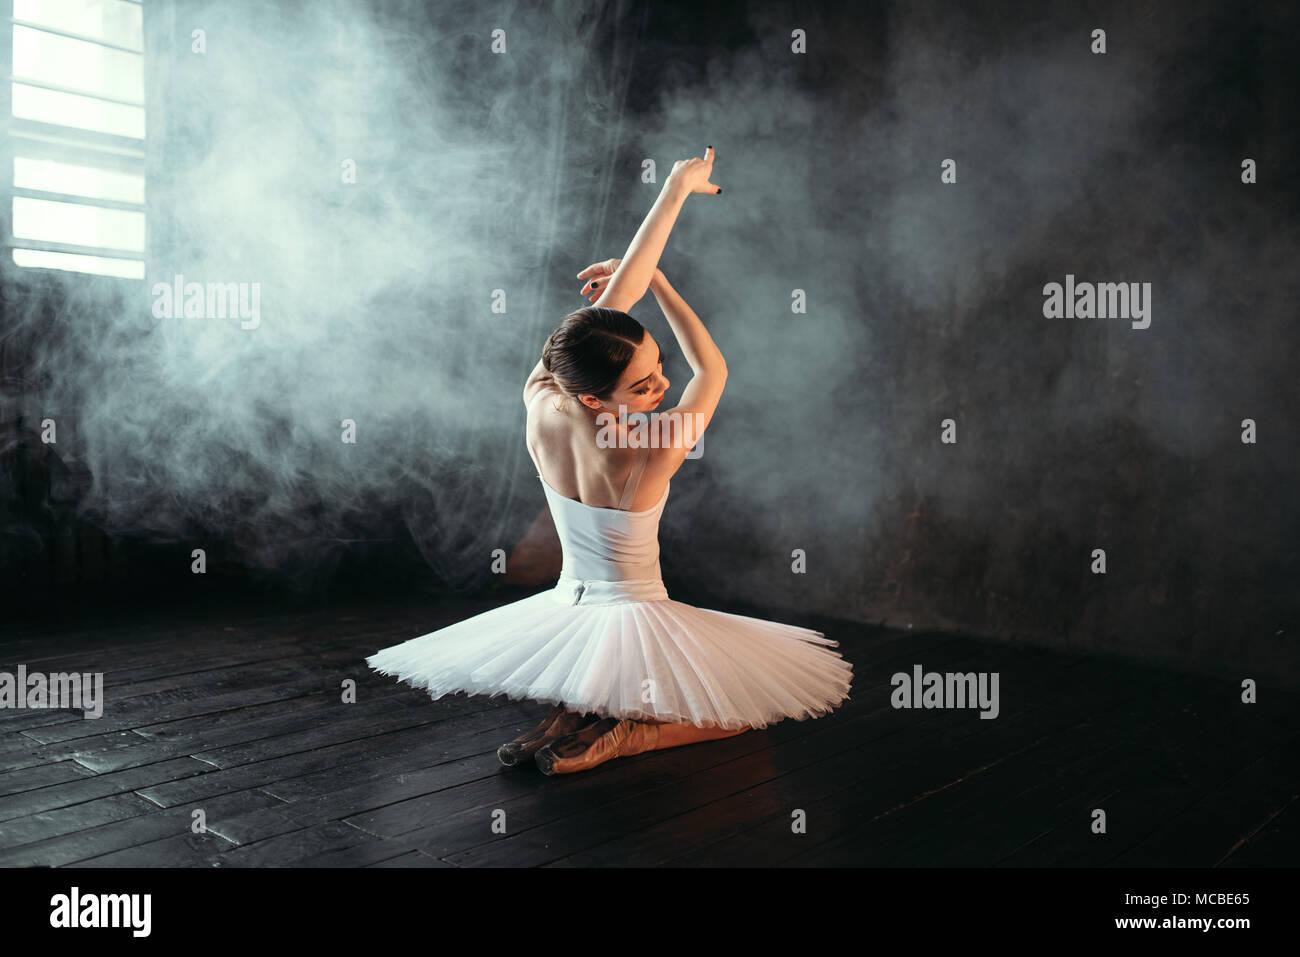 Femme artiste de ballet classique sitting on floor Photo Stock